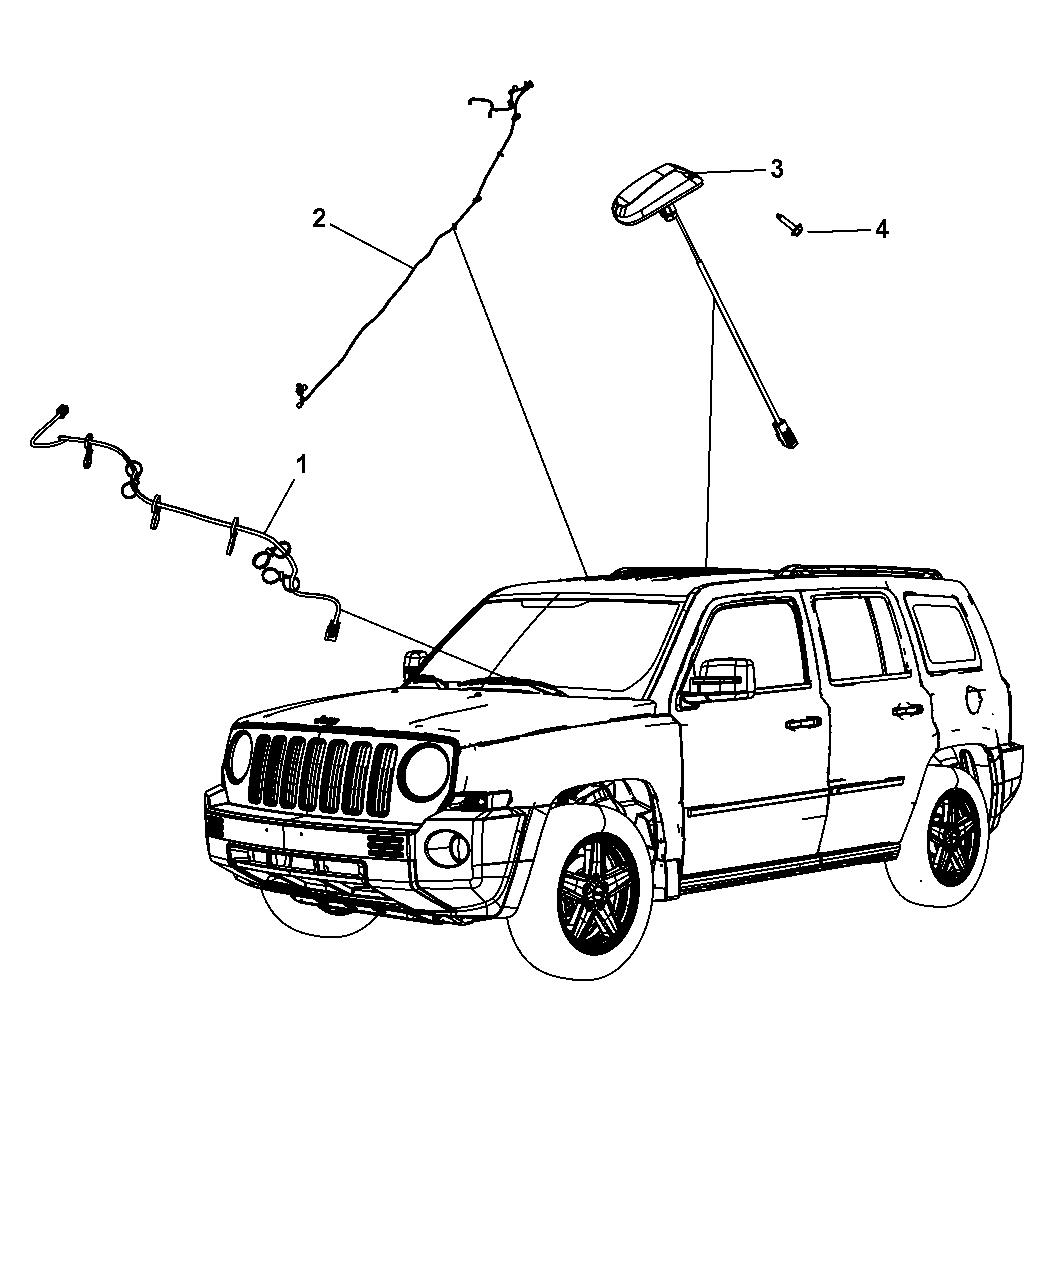 68066437aa